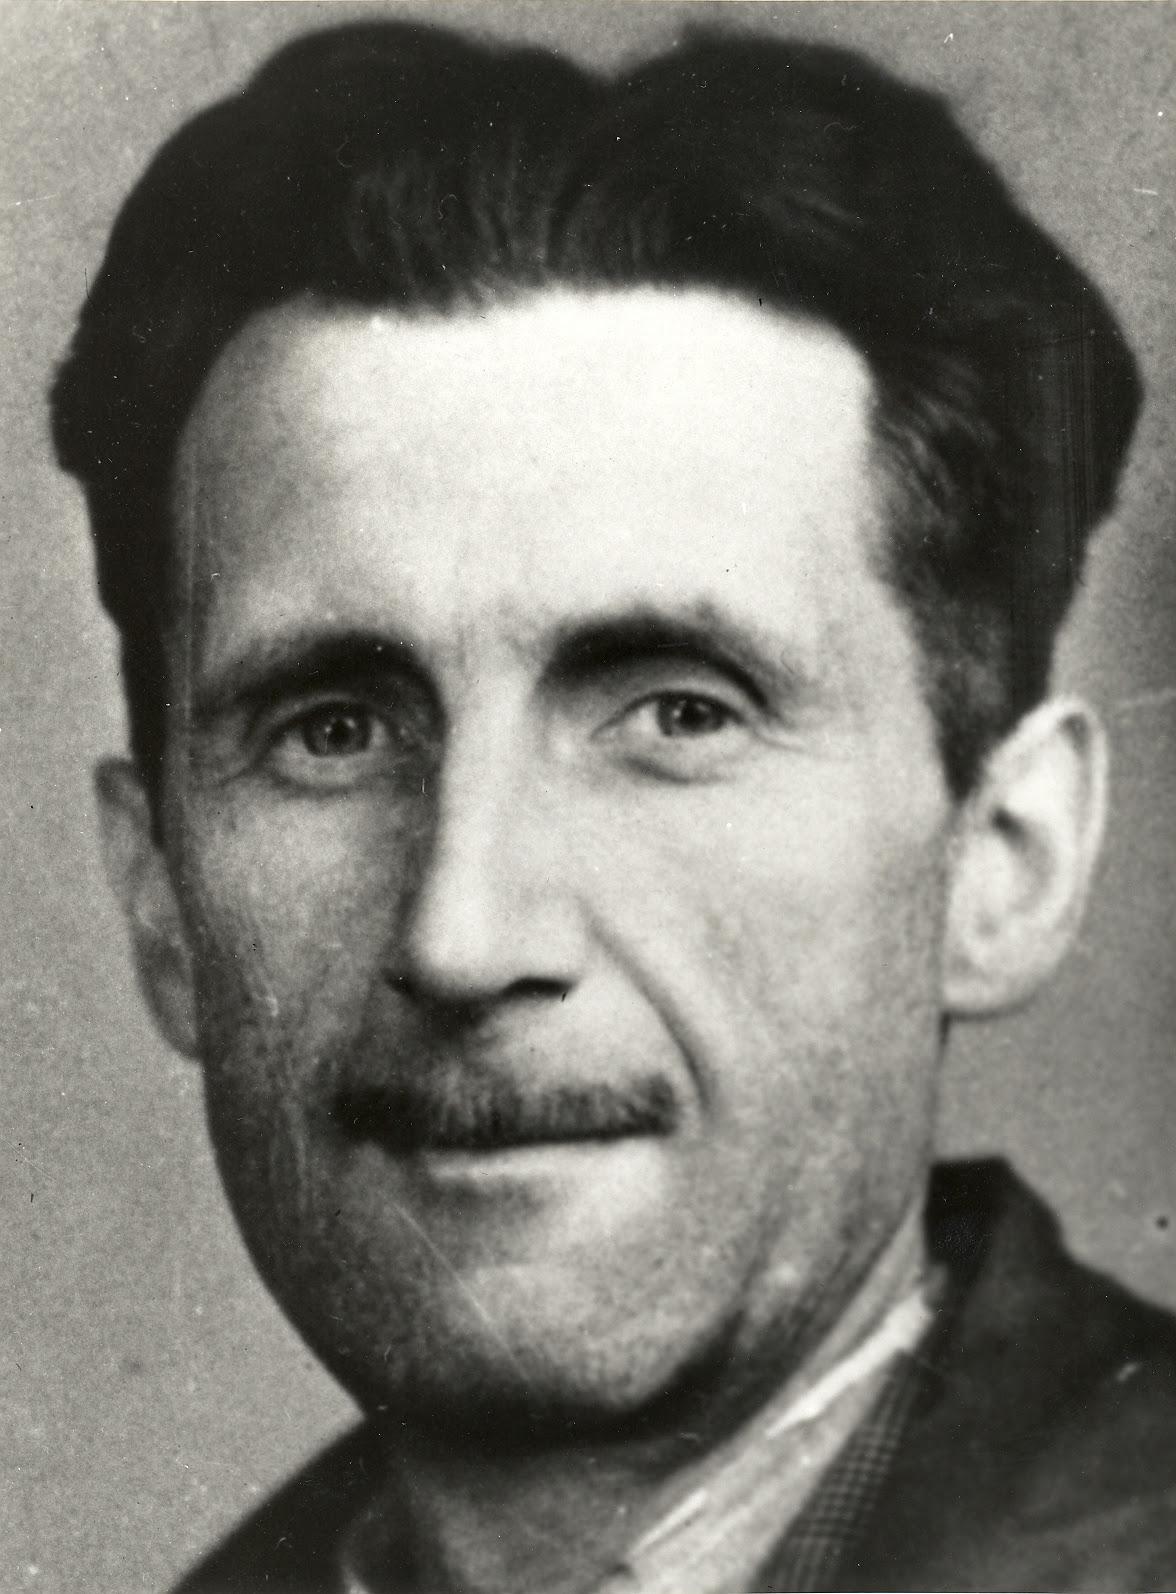 http://upload.wikimedia.org/wikipedia/commons/7/7e/George_Orwell_press_photo.jpg